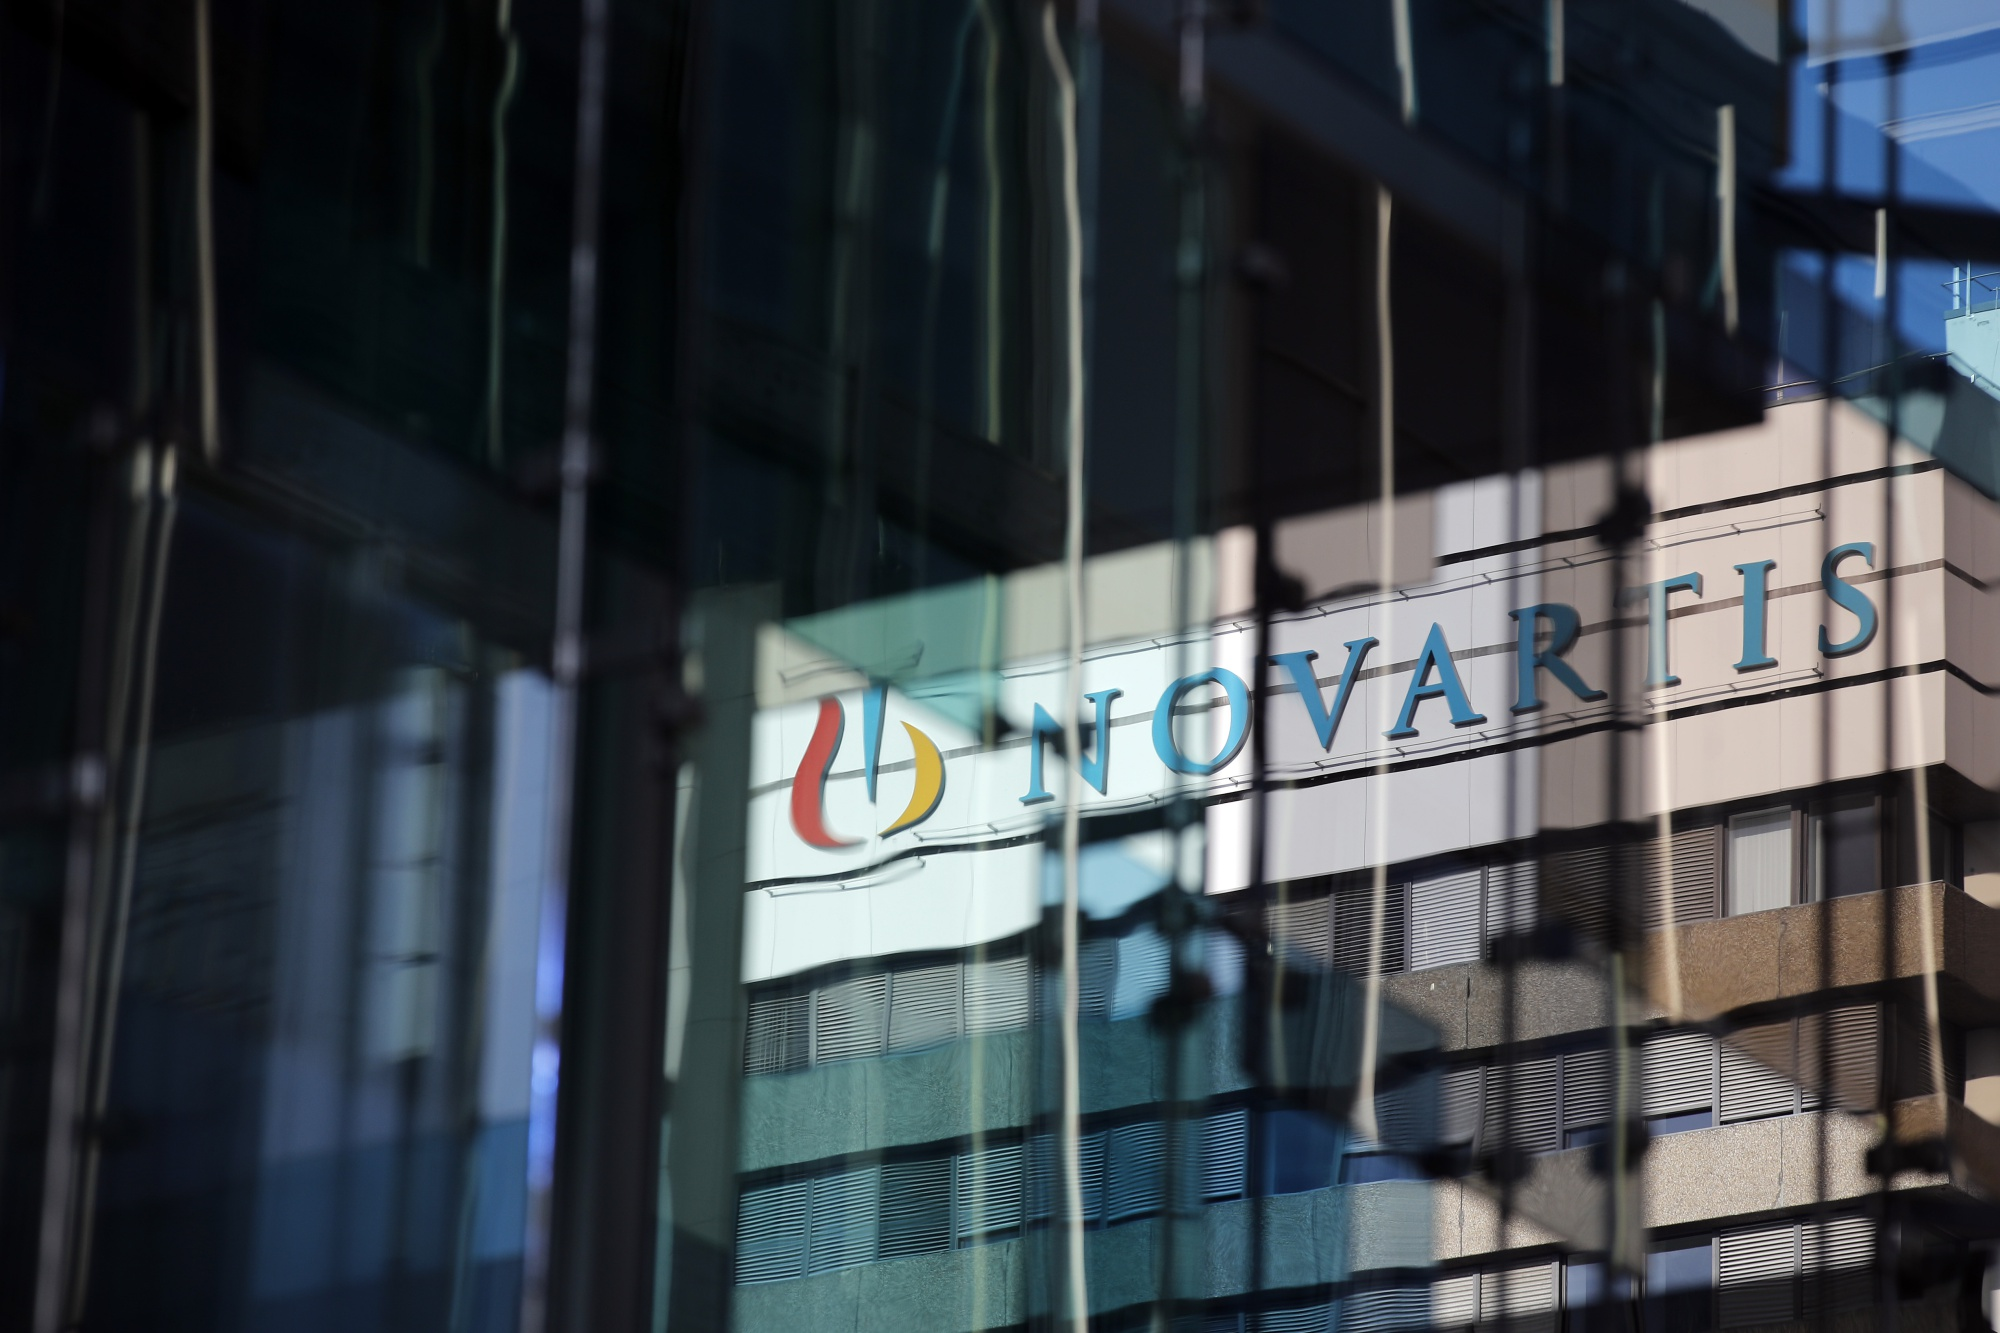 bloomberg.com - Eleni Chrepa - Novartis Probe Finds No Trace of Payoffs to Greek Officials